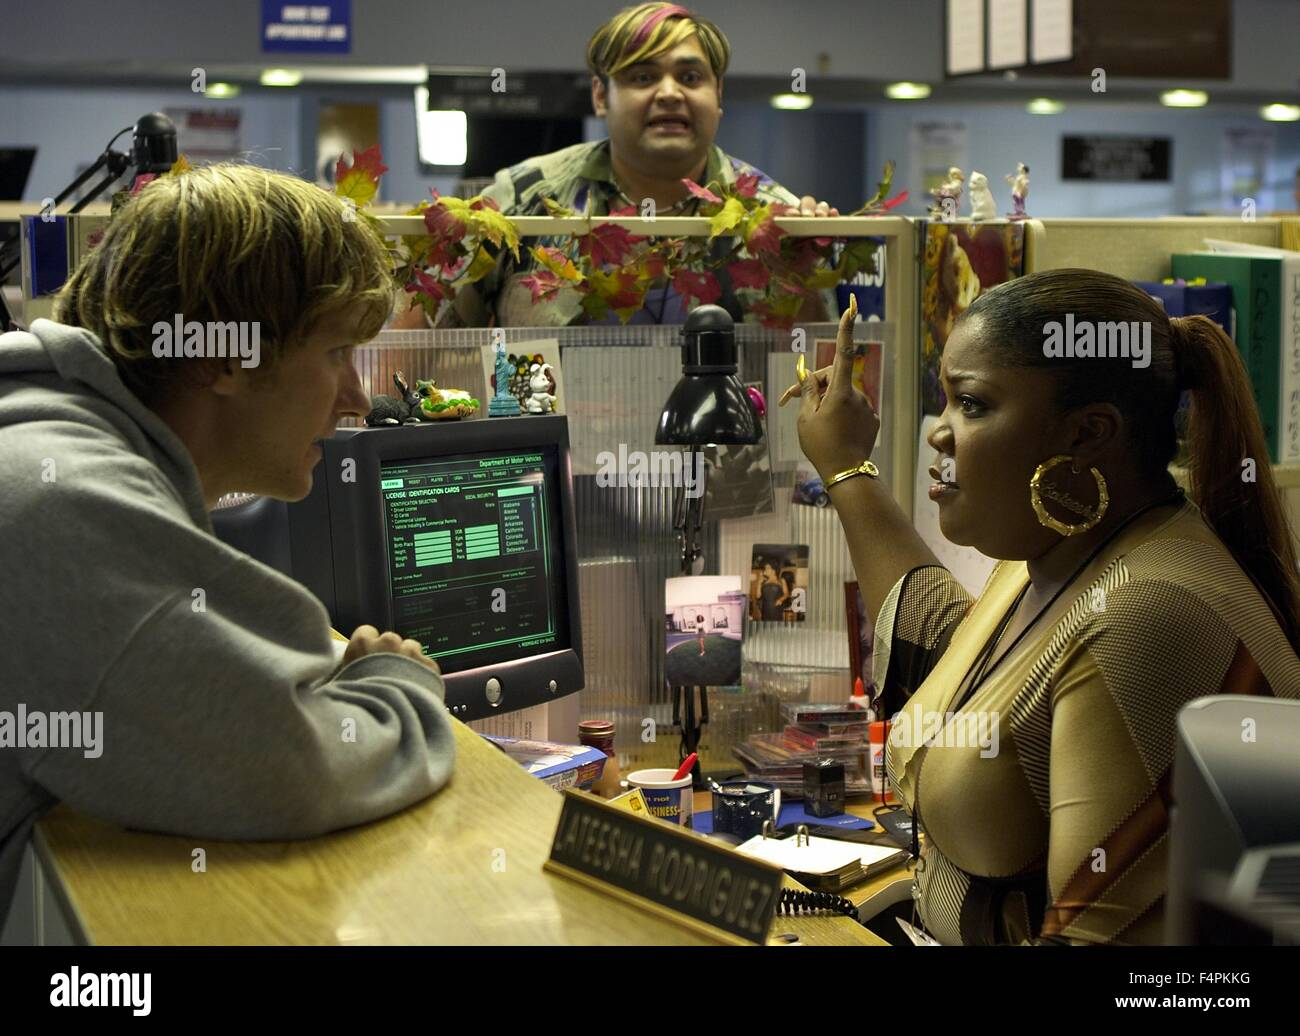 Domino / 2005 dirigida por Tony Scott [New Line Cinema] Imagen De Stock